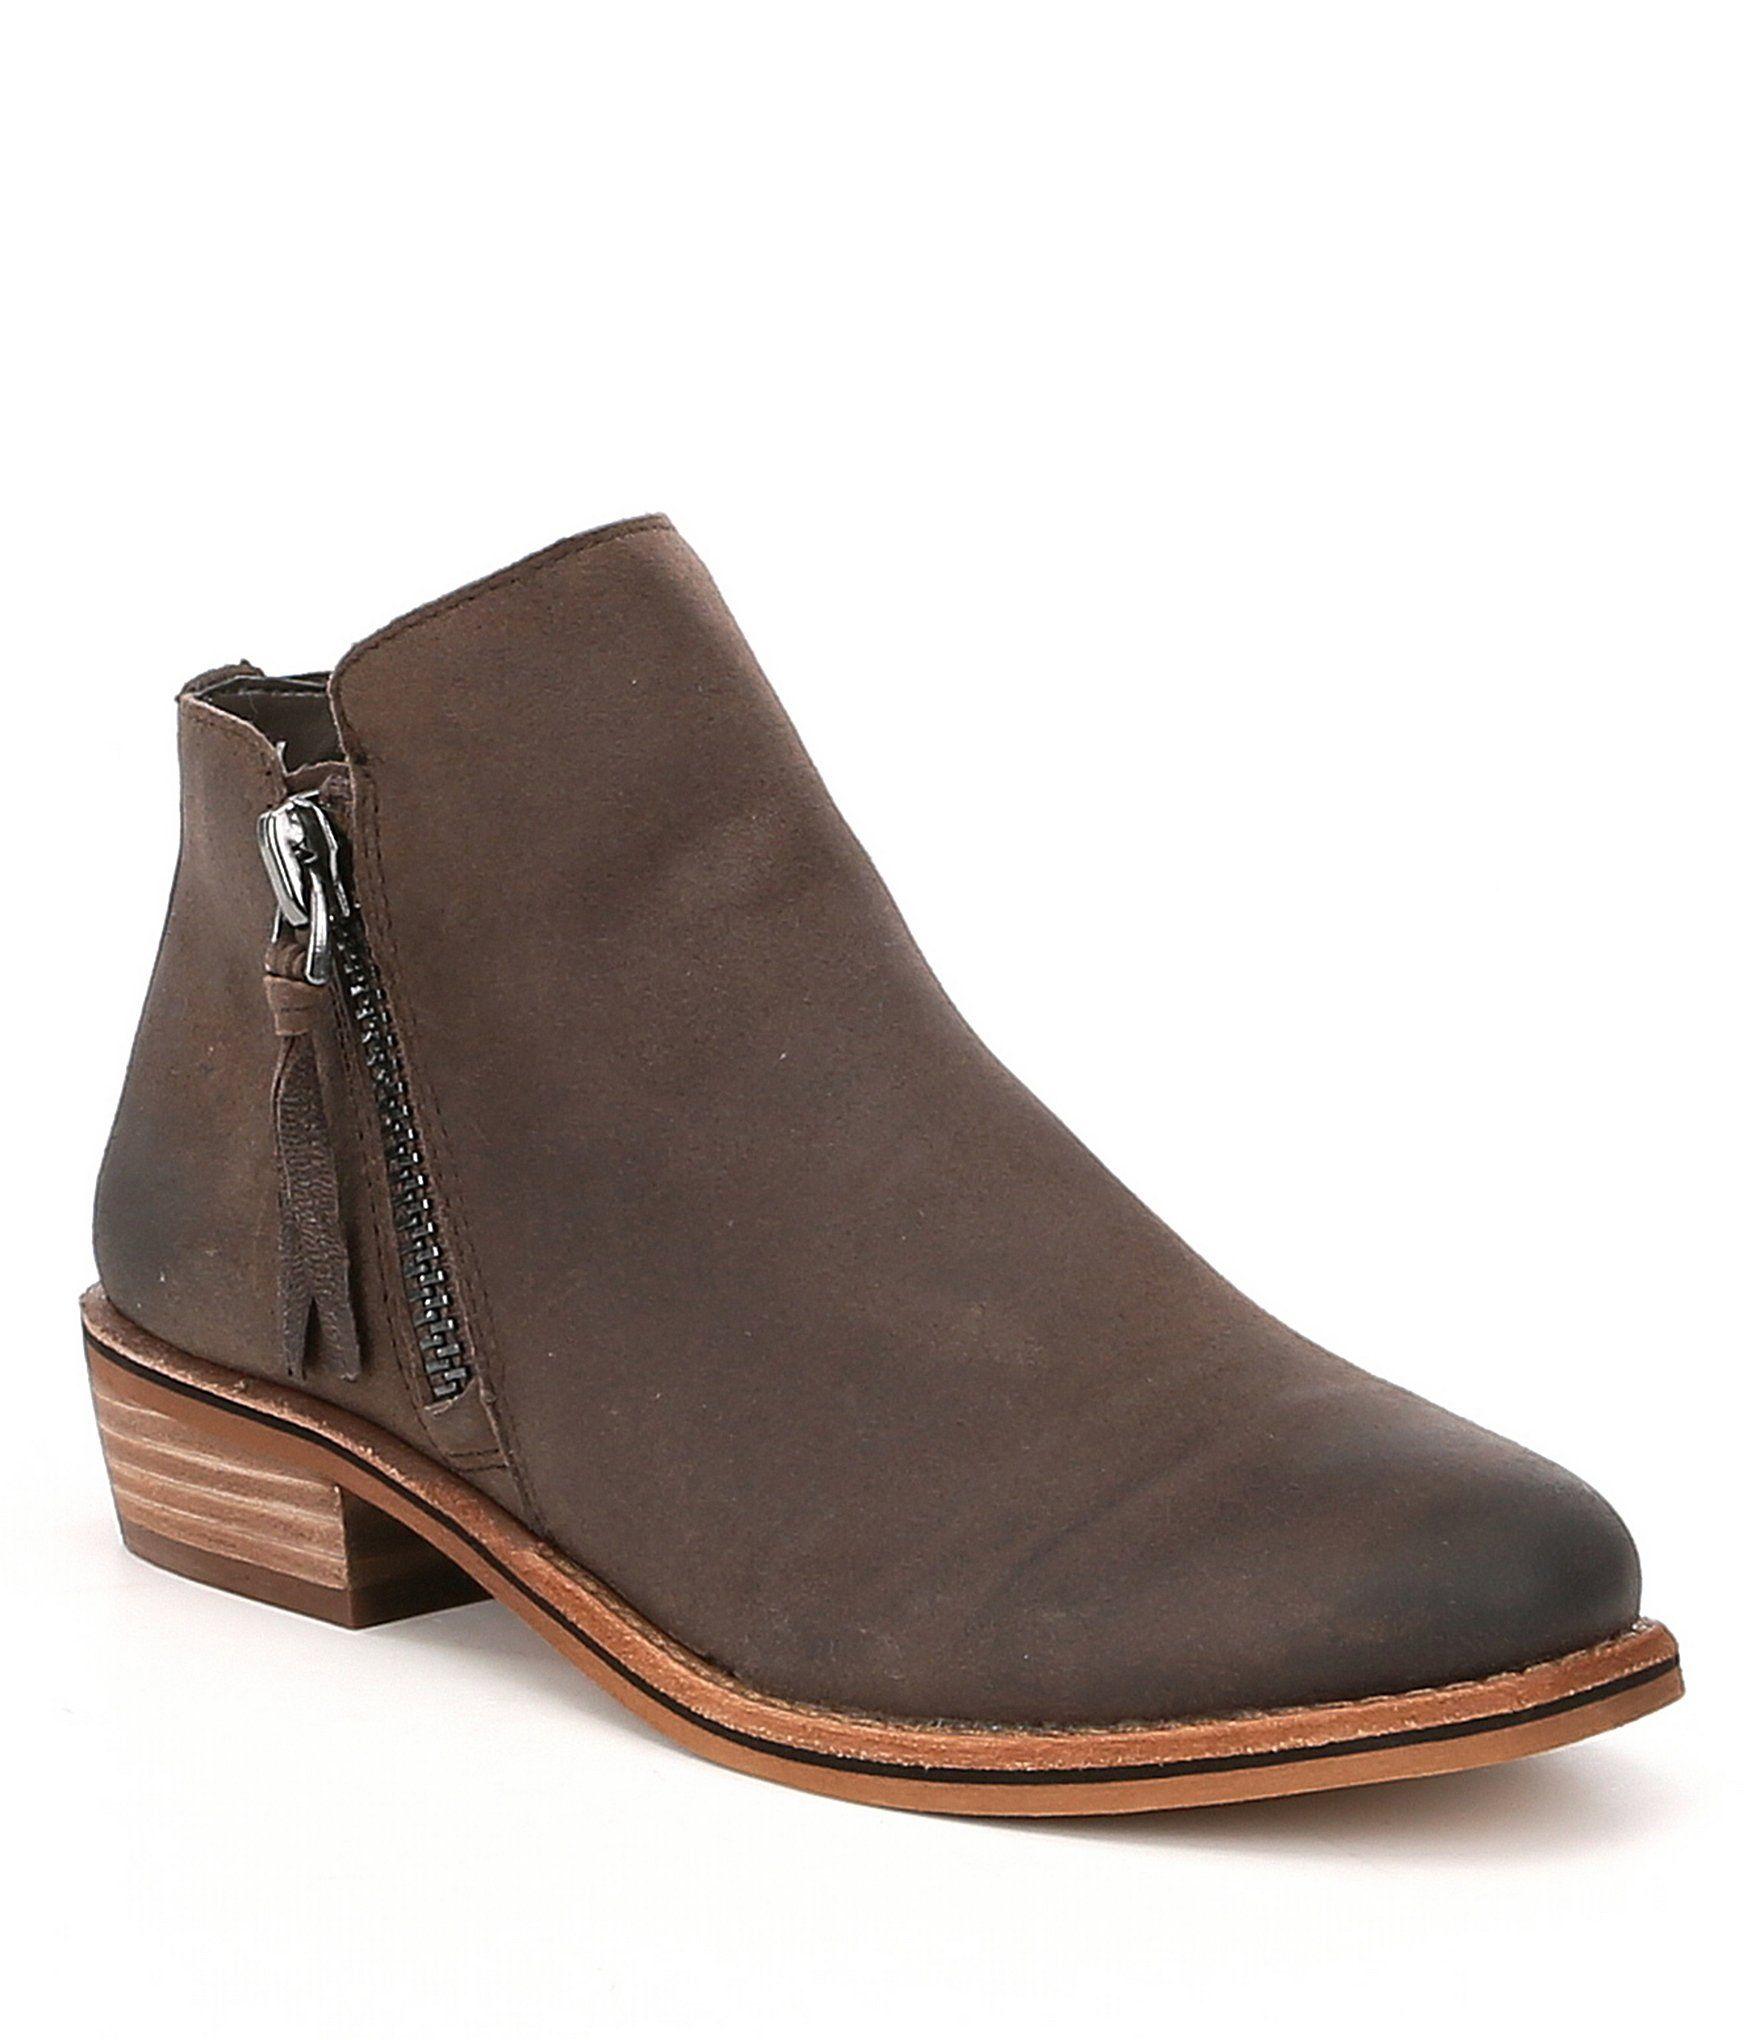 e7437fd3ffea3 GB A-Lister Double Zip Closure Leather Block Heel Booties | Mid-Calf ...